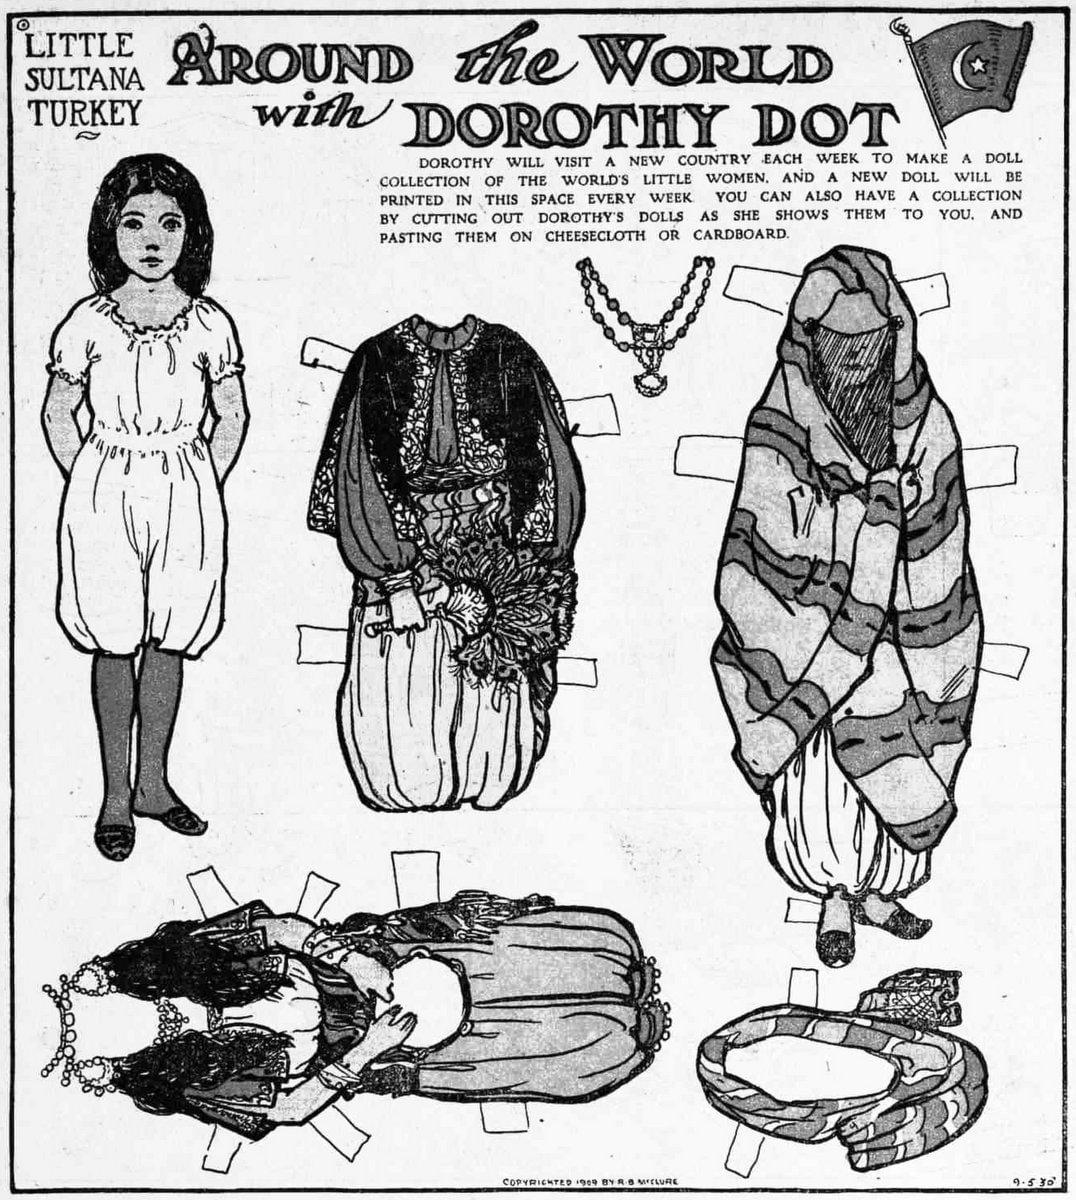 dorothy dot paper doll little sultana of turkey 1909 click